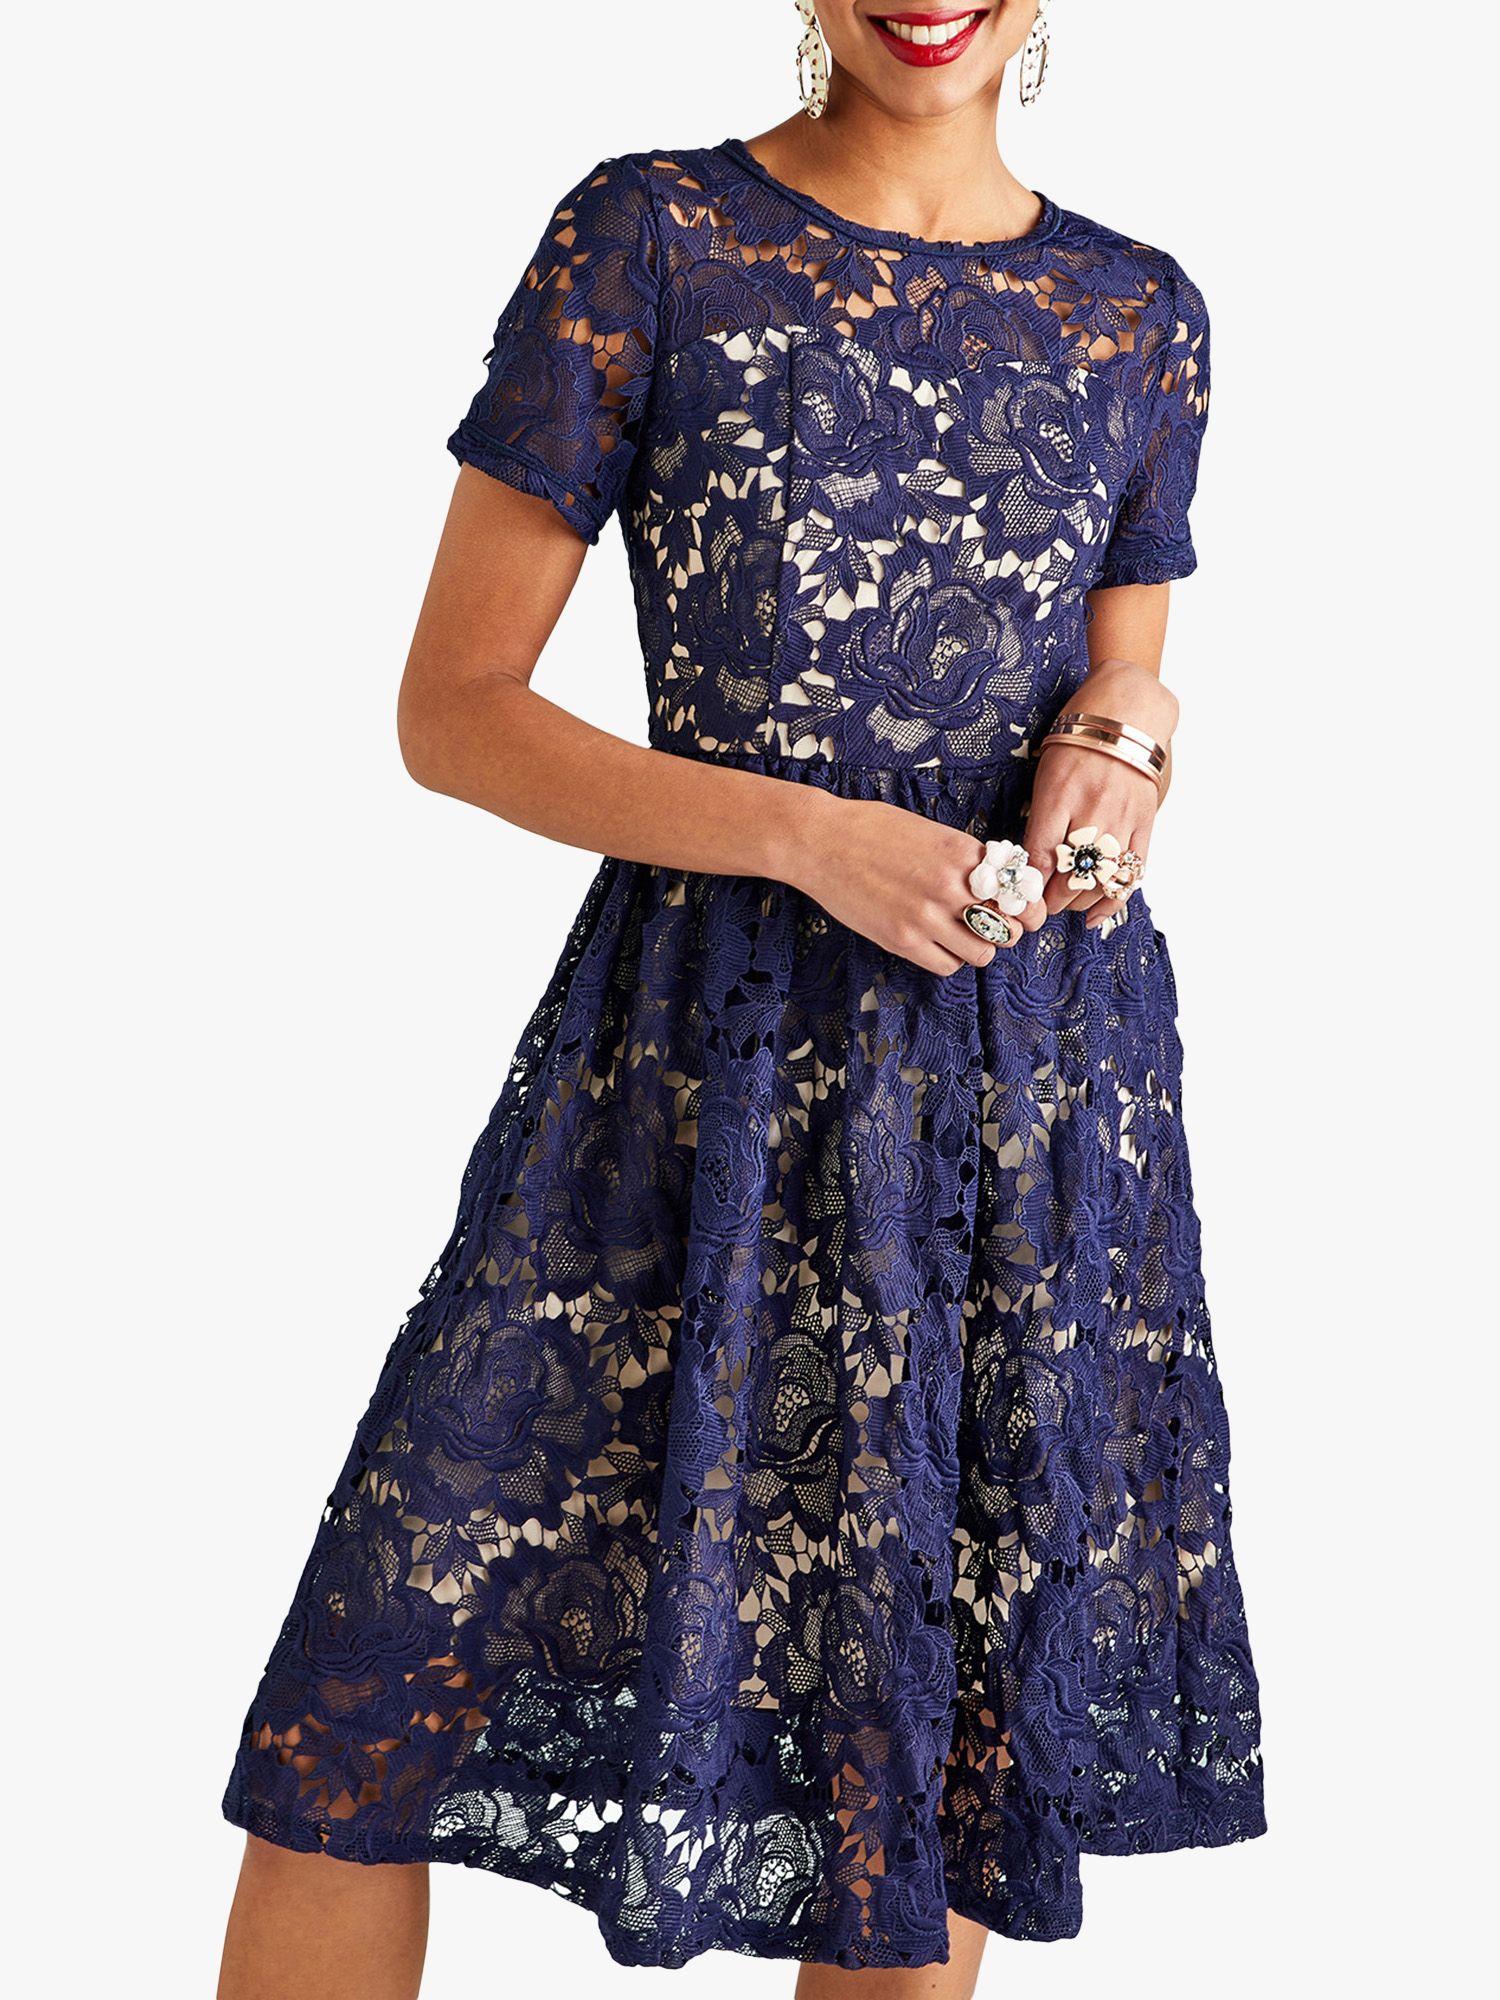 Yumi Curves Yumi Lace Overlay Party Dress, Navy